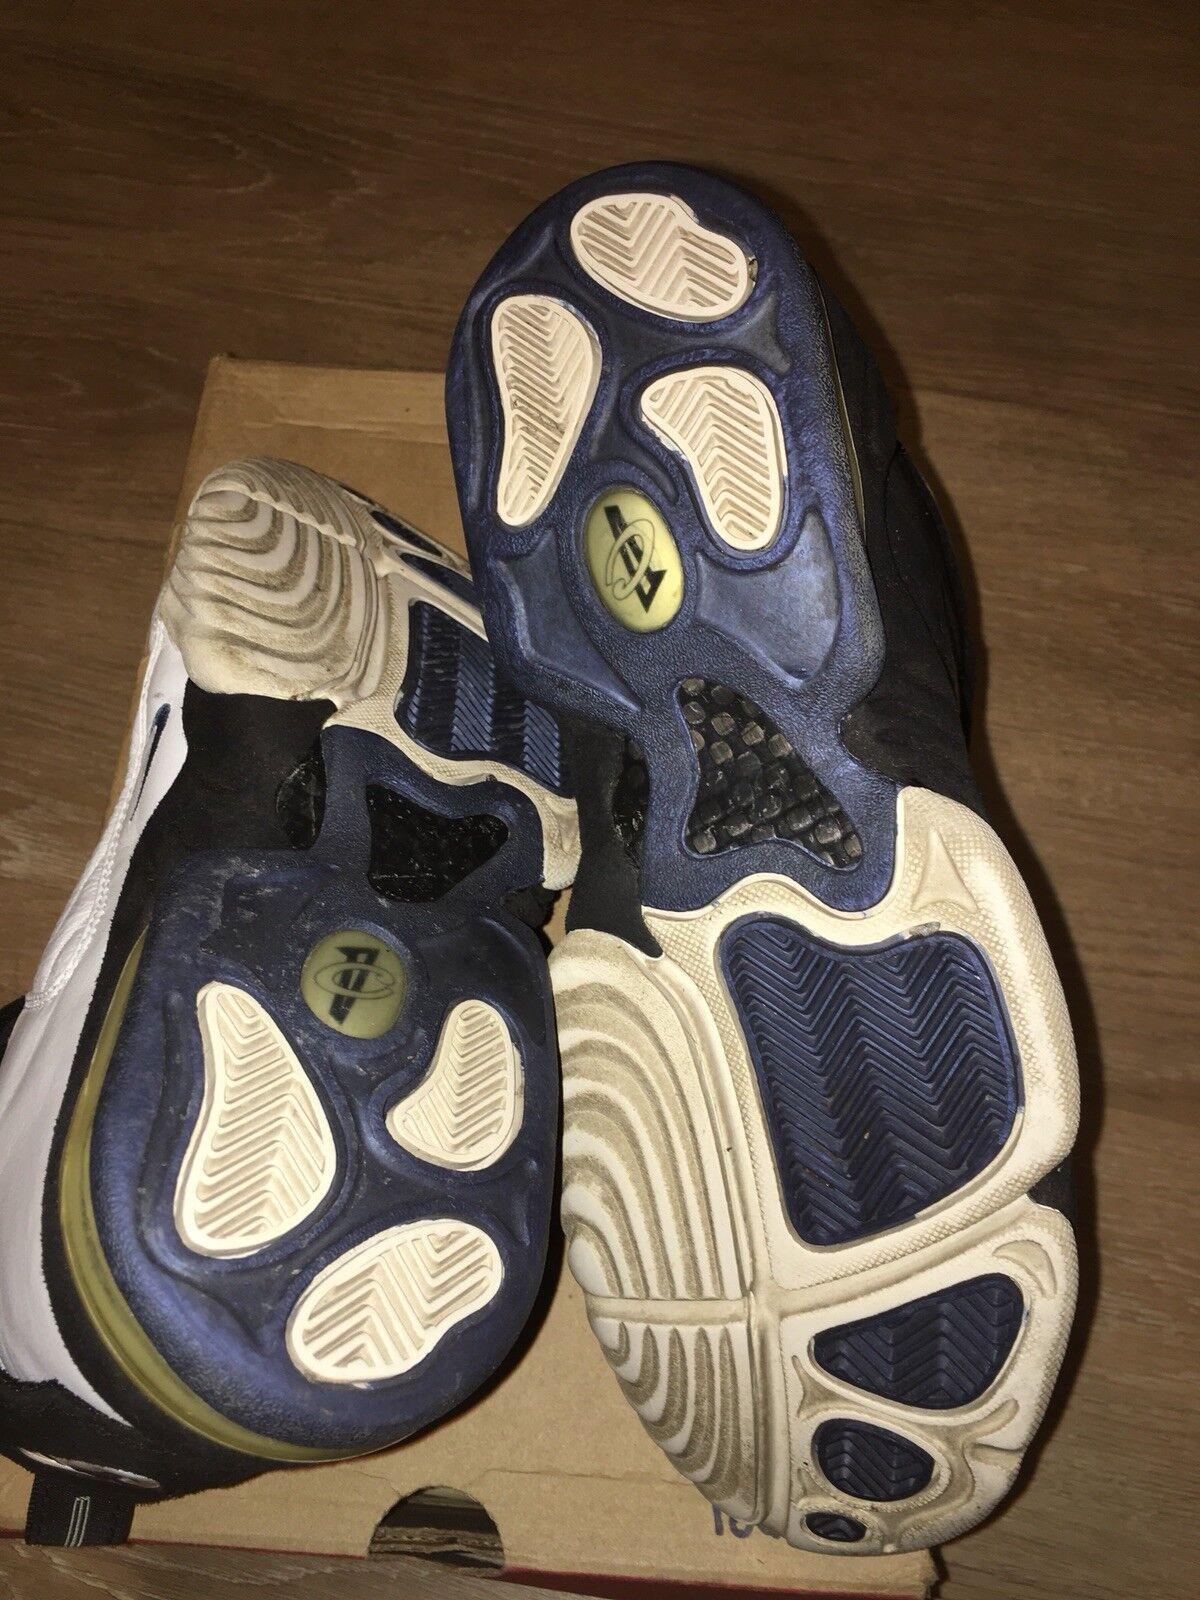 41d61c8dedd481 ... Vintage 1998 Nike Air Penny Hardaway Hardaway Hardaway IV Basketball  Shoes OG Size 9.5 Jordan 75122e ...